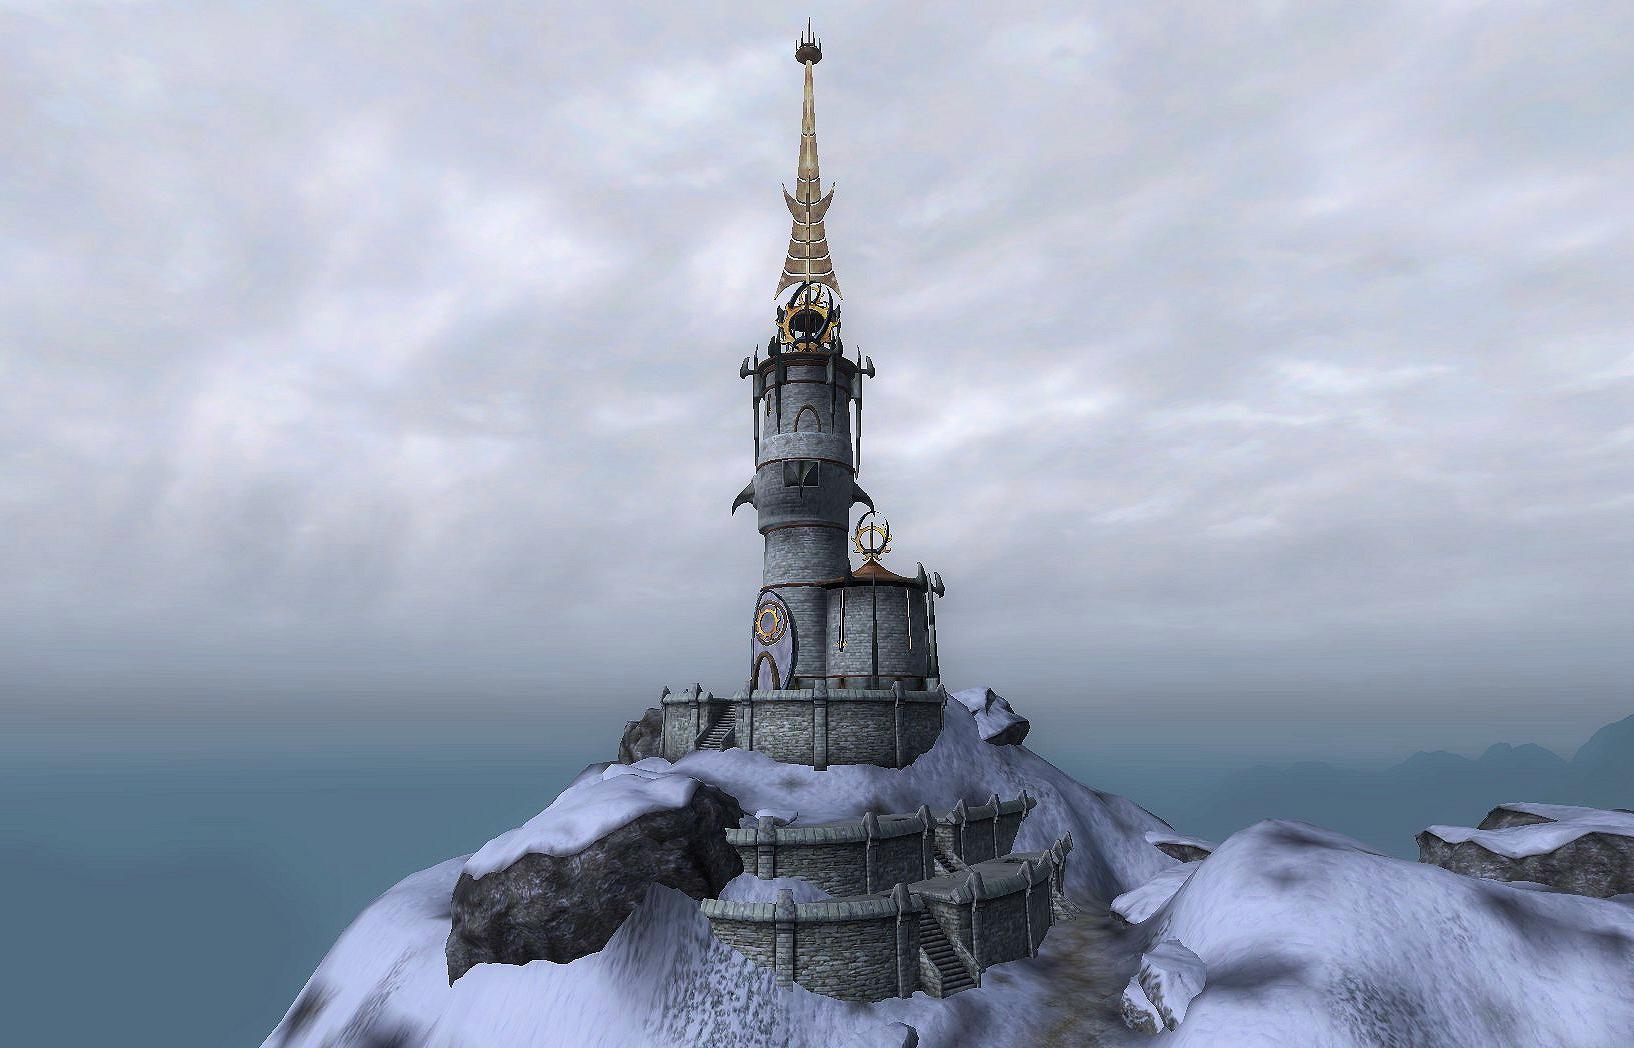 Wizards Tower Elder Scrolls Fandom Powered By Wikia